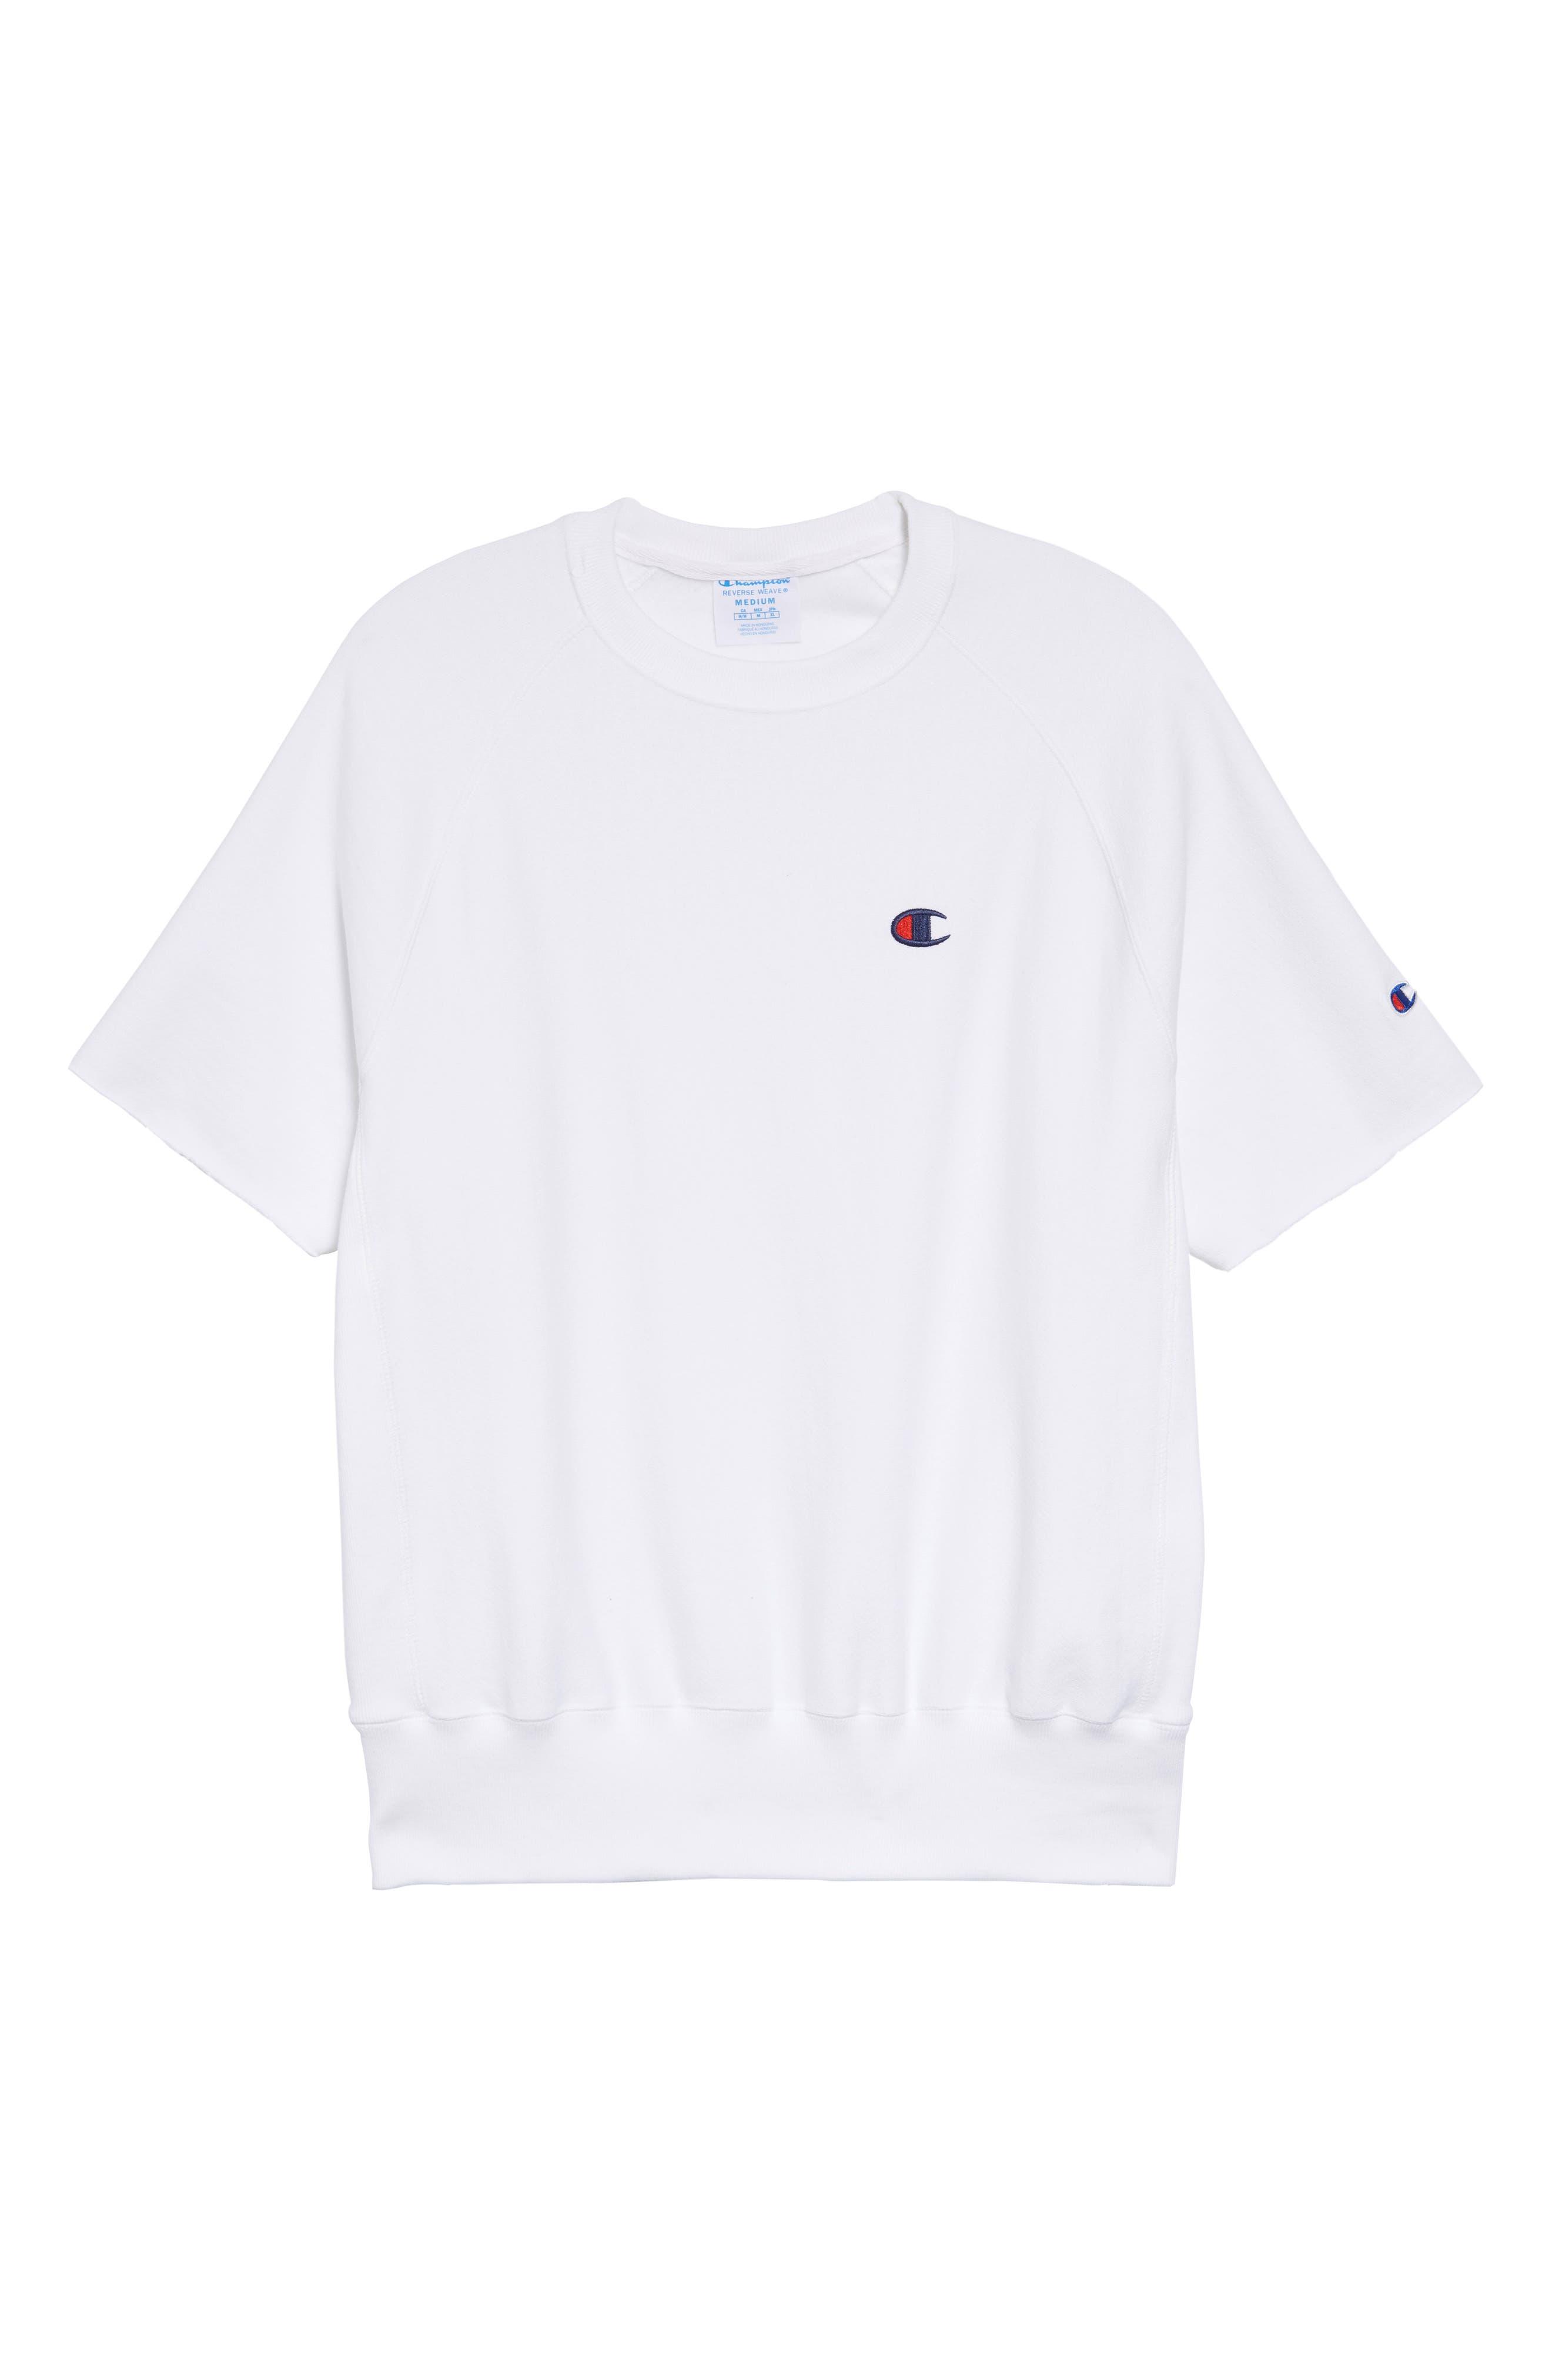 Reverse Weave Short Sleeve Sweatshirt,                             Alternate thumbnail 3, color,                             WHITE